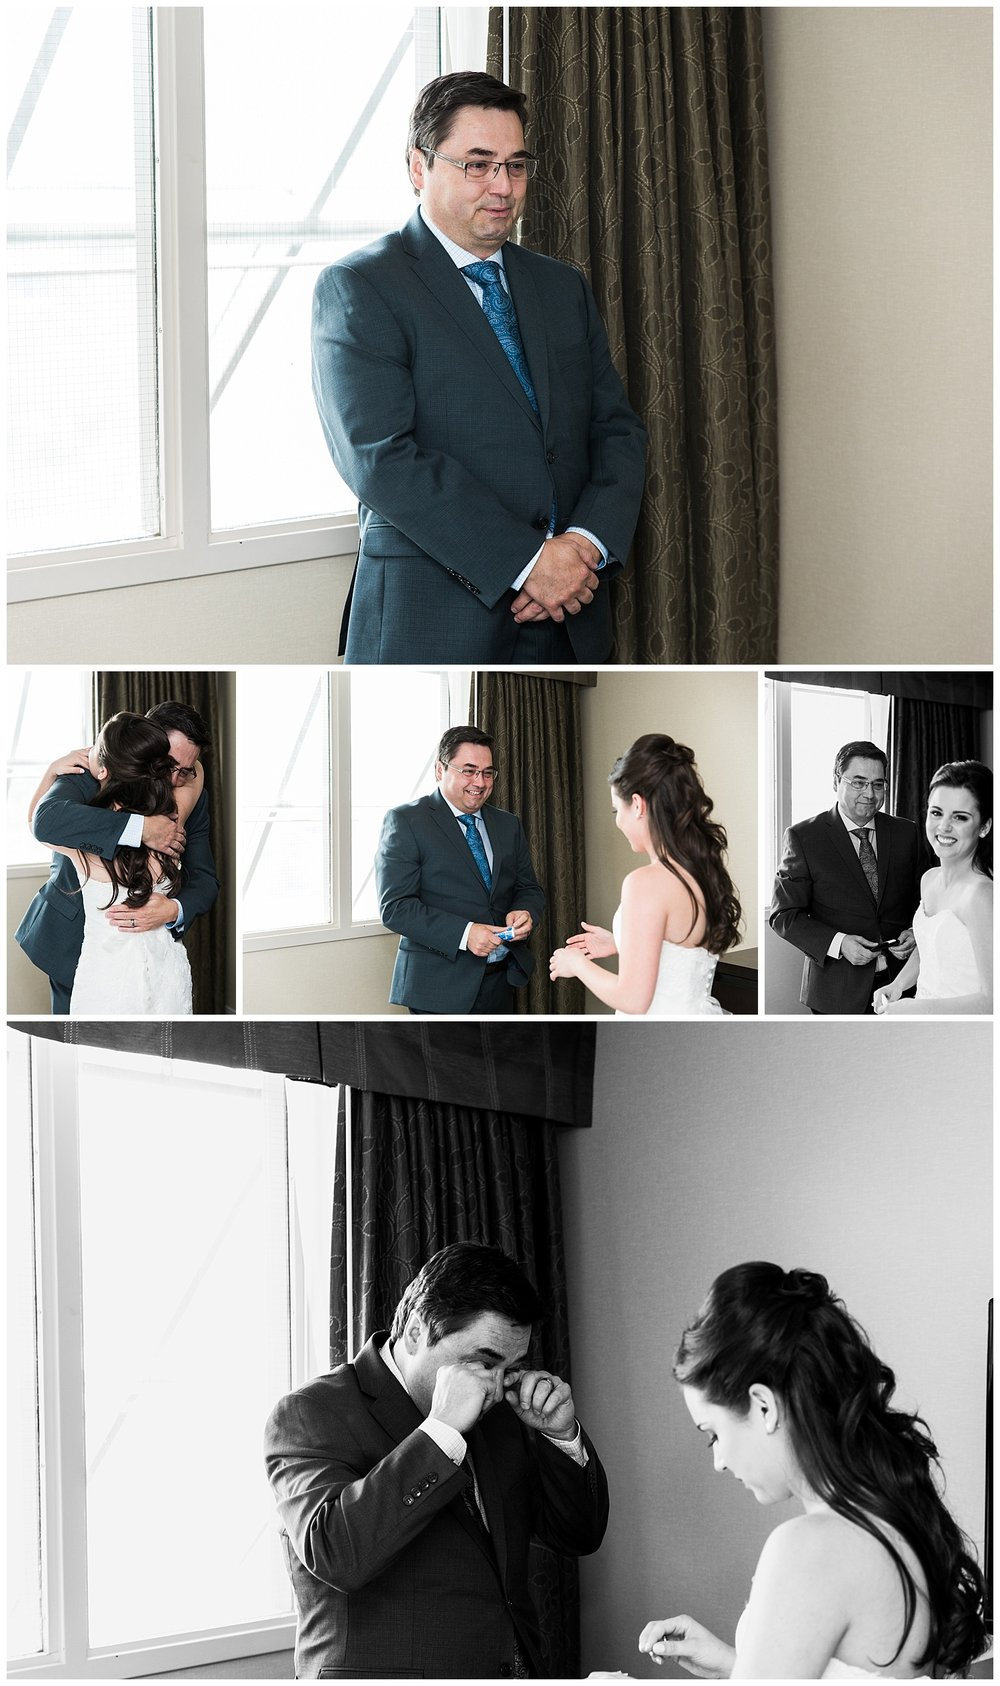 calgary-photographer-lake-house-wedding-5.jpg